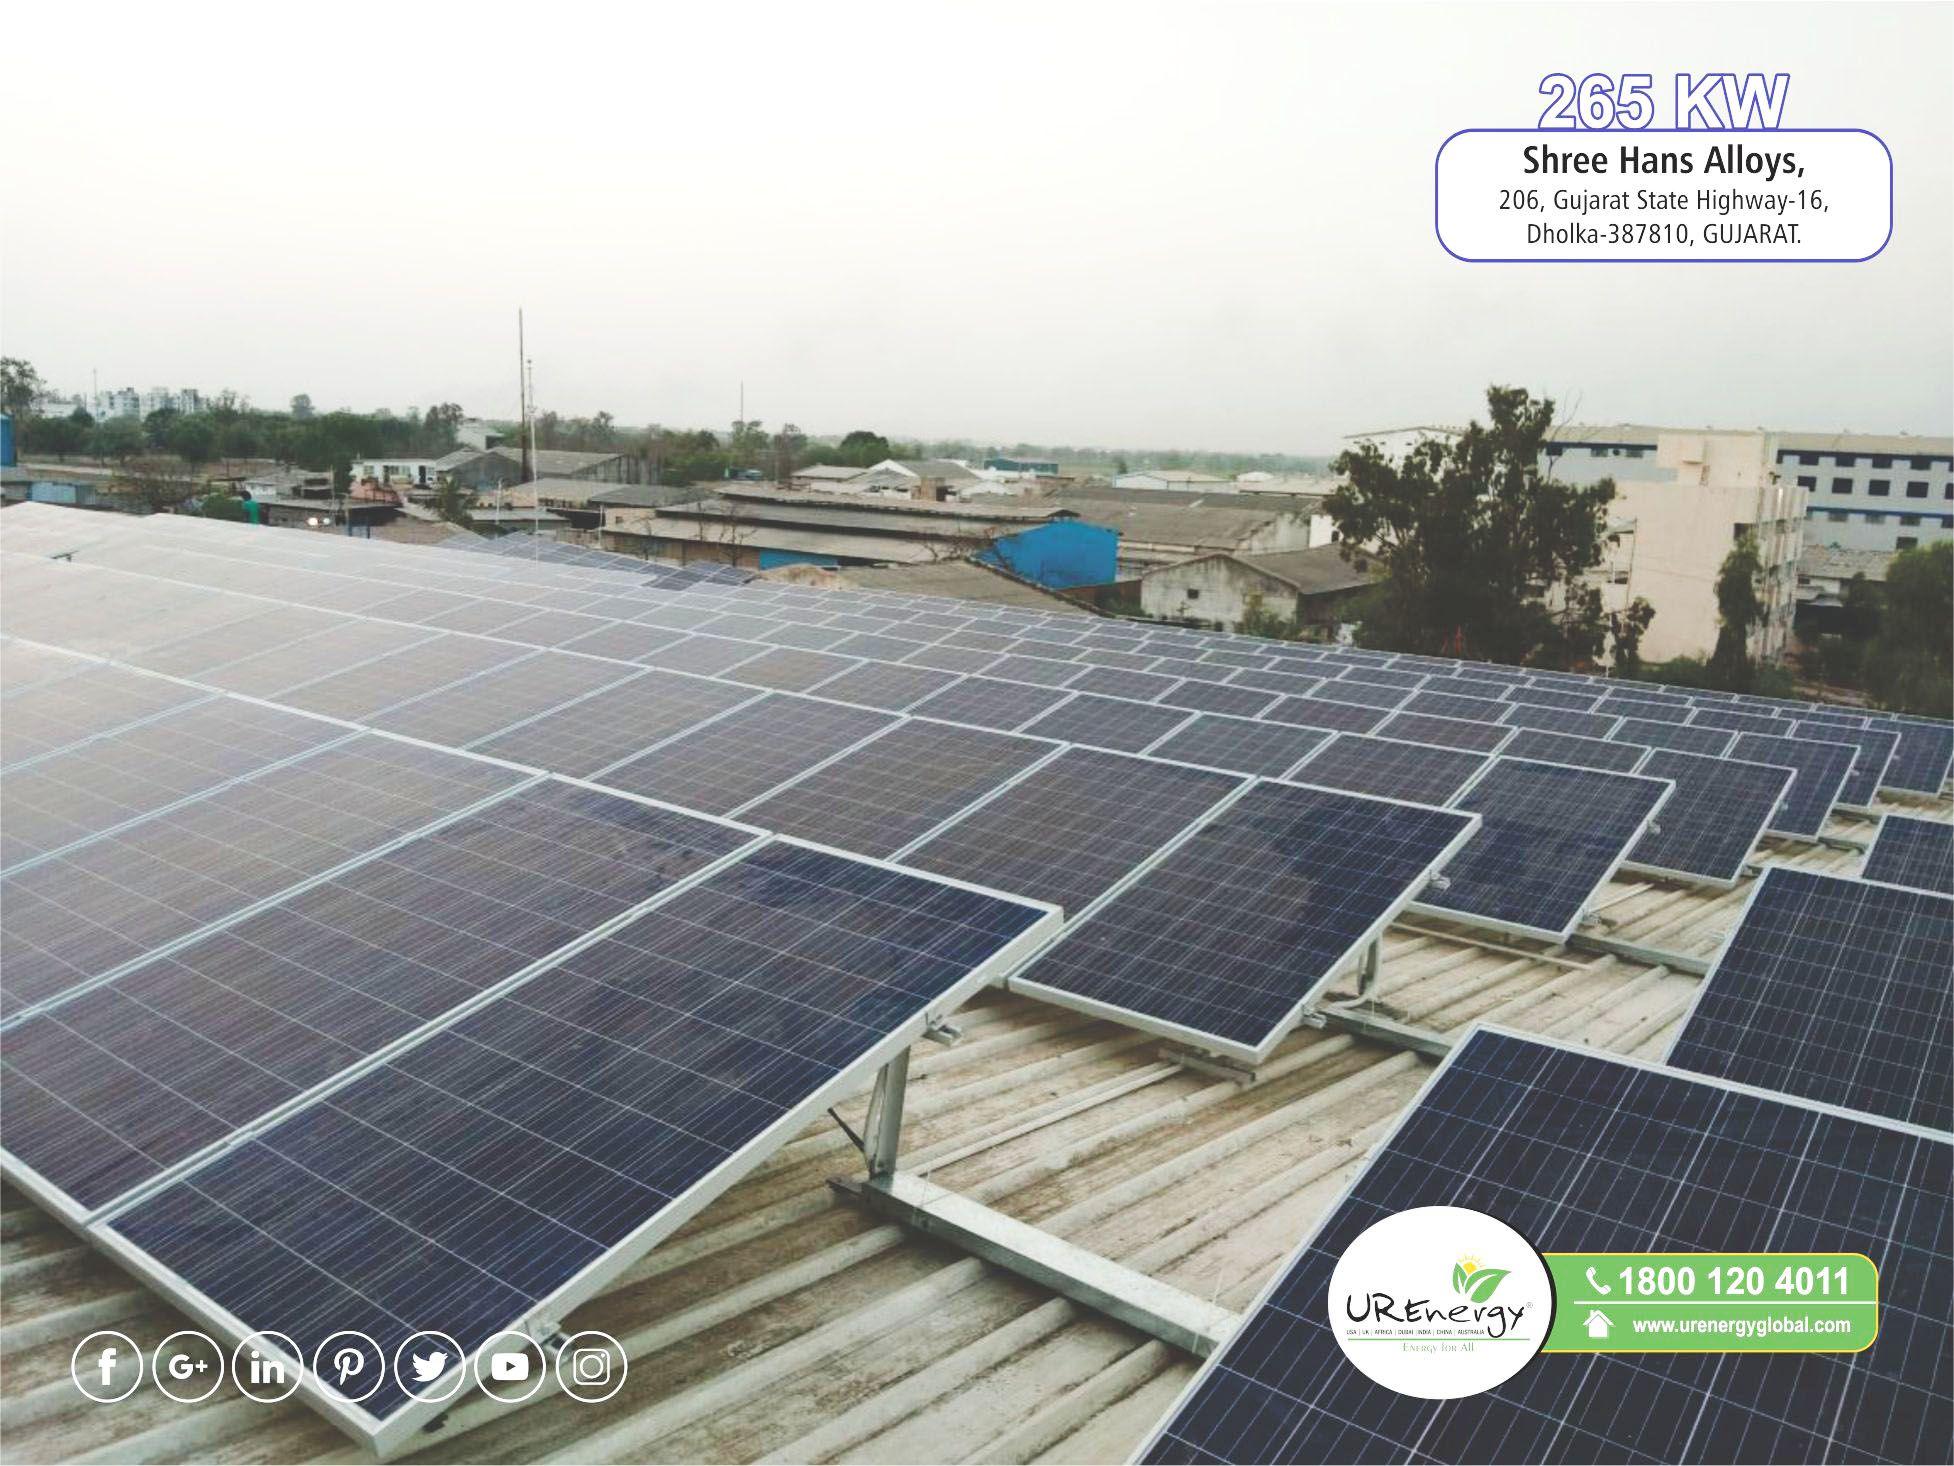 Rooftop Solar Panel Inverters Water Pump Solar Epc Gujarat India U R Energy Solar Solar Energy Solutions Solar Water Pump